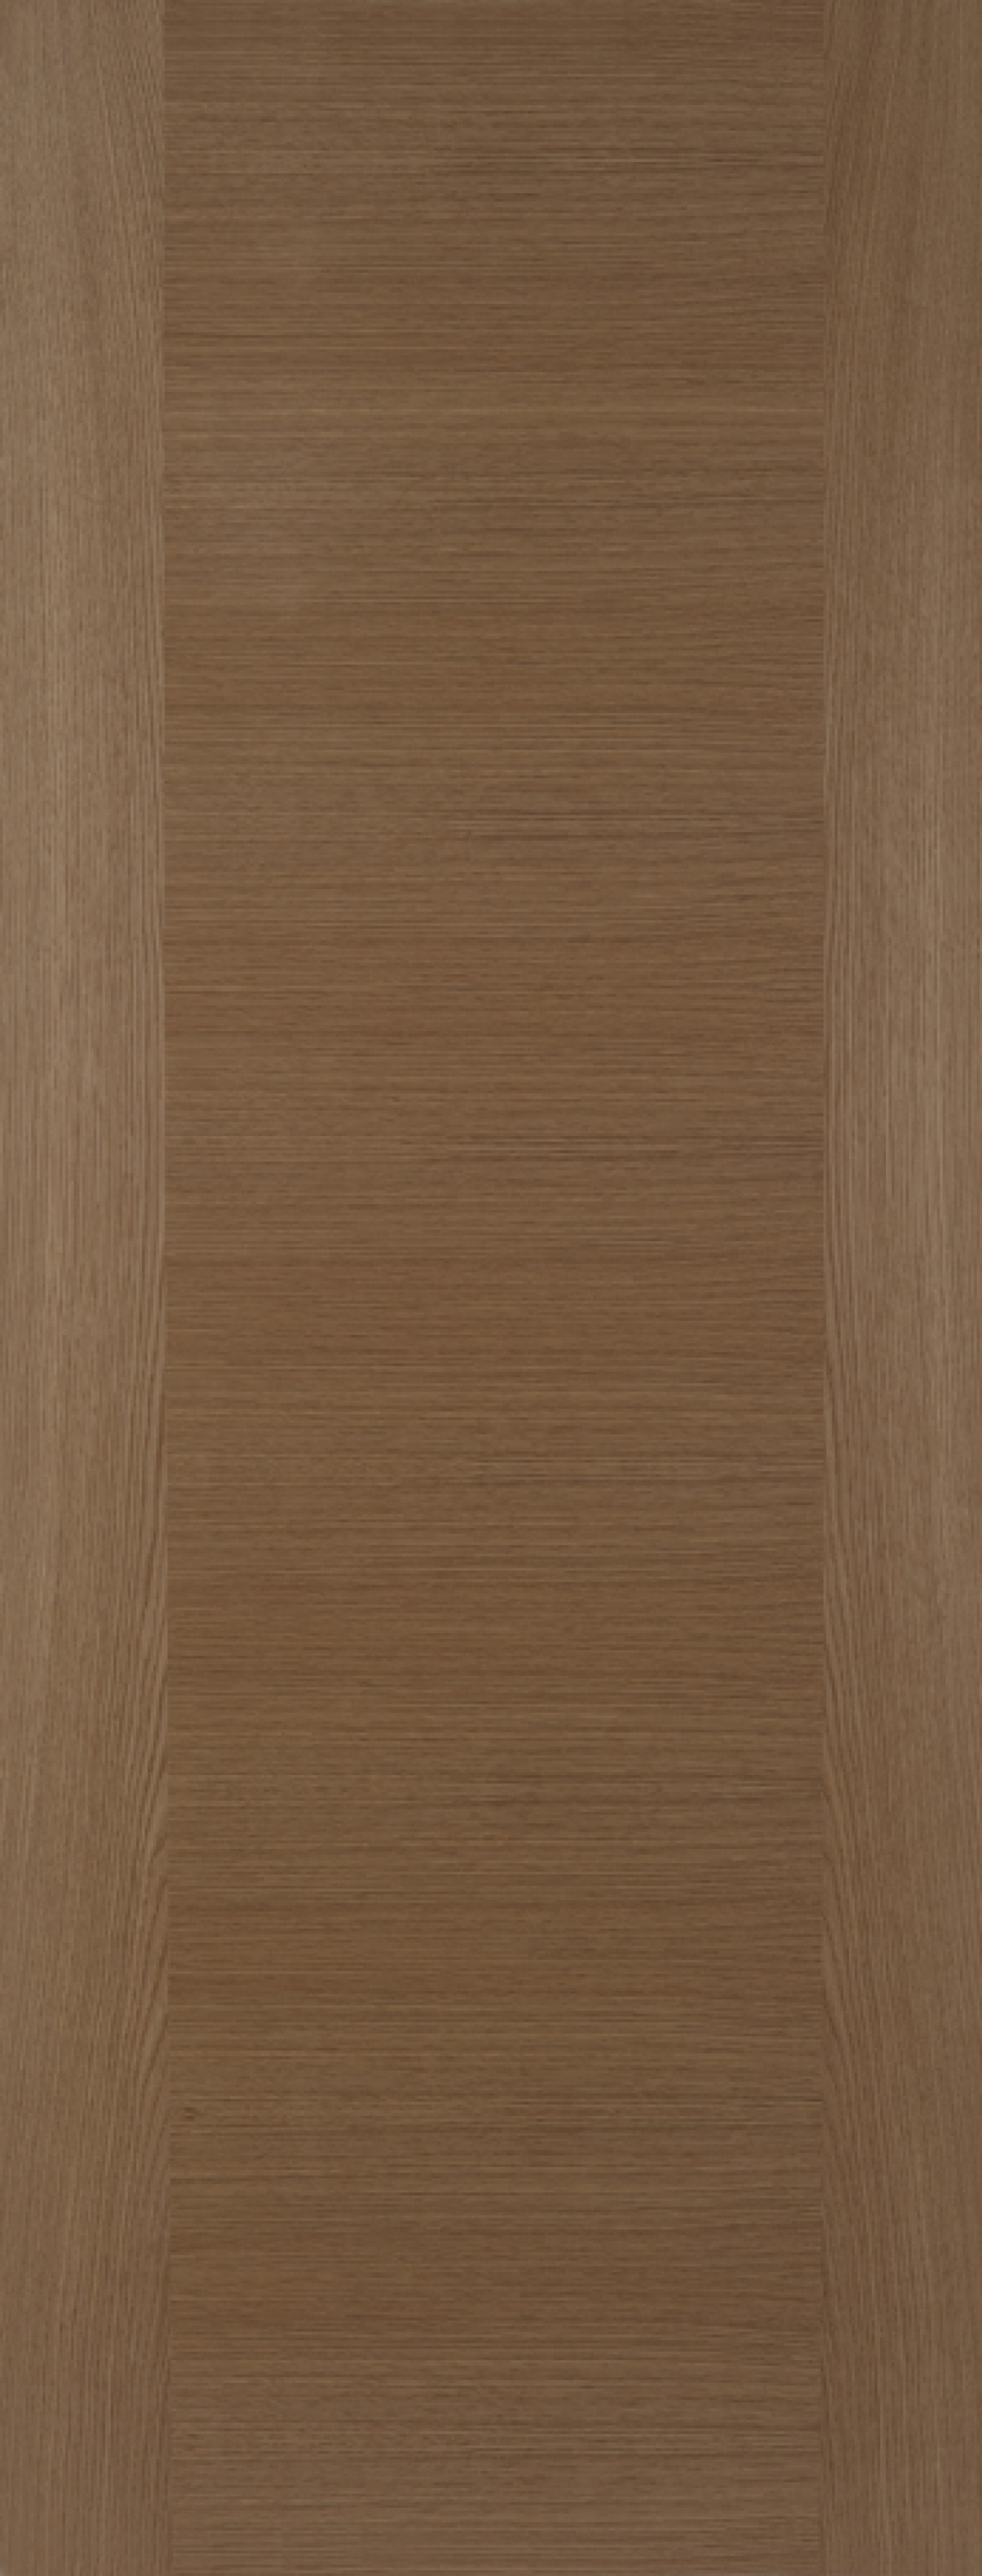 Oak Aspect - Prefinished